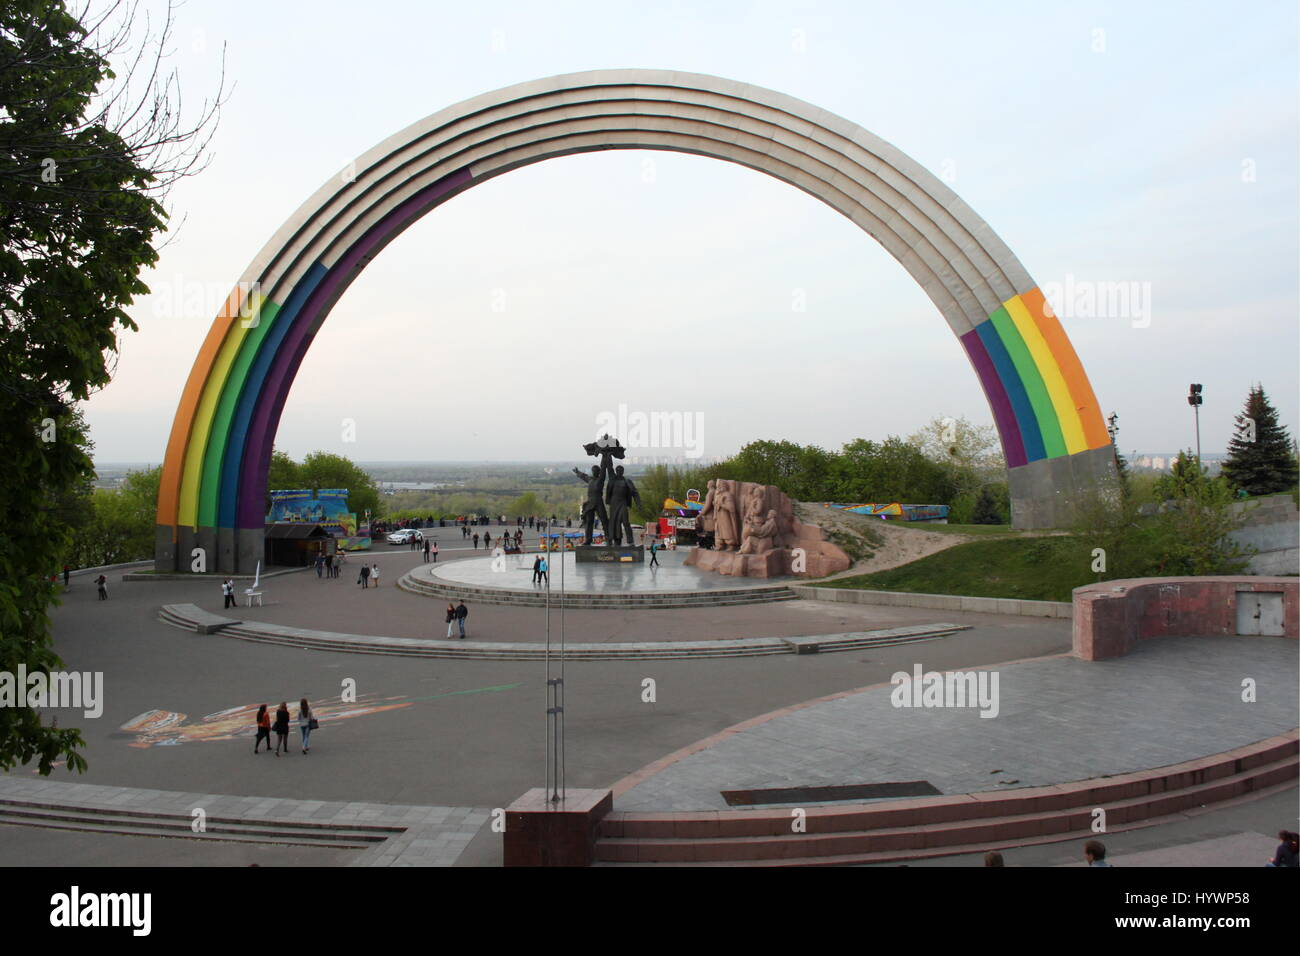 Kiev, Ukraine  26th Apr, 2017  The Arch of People's